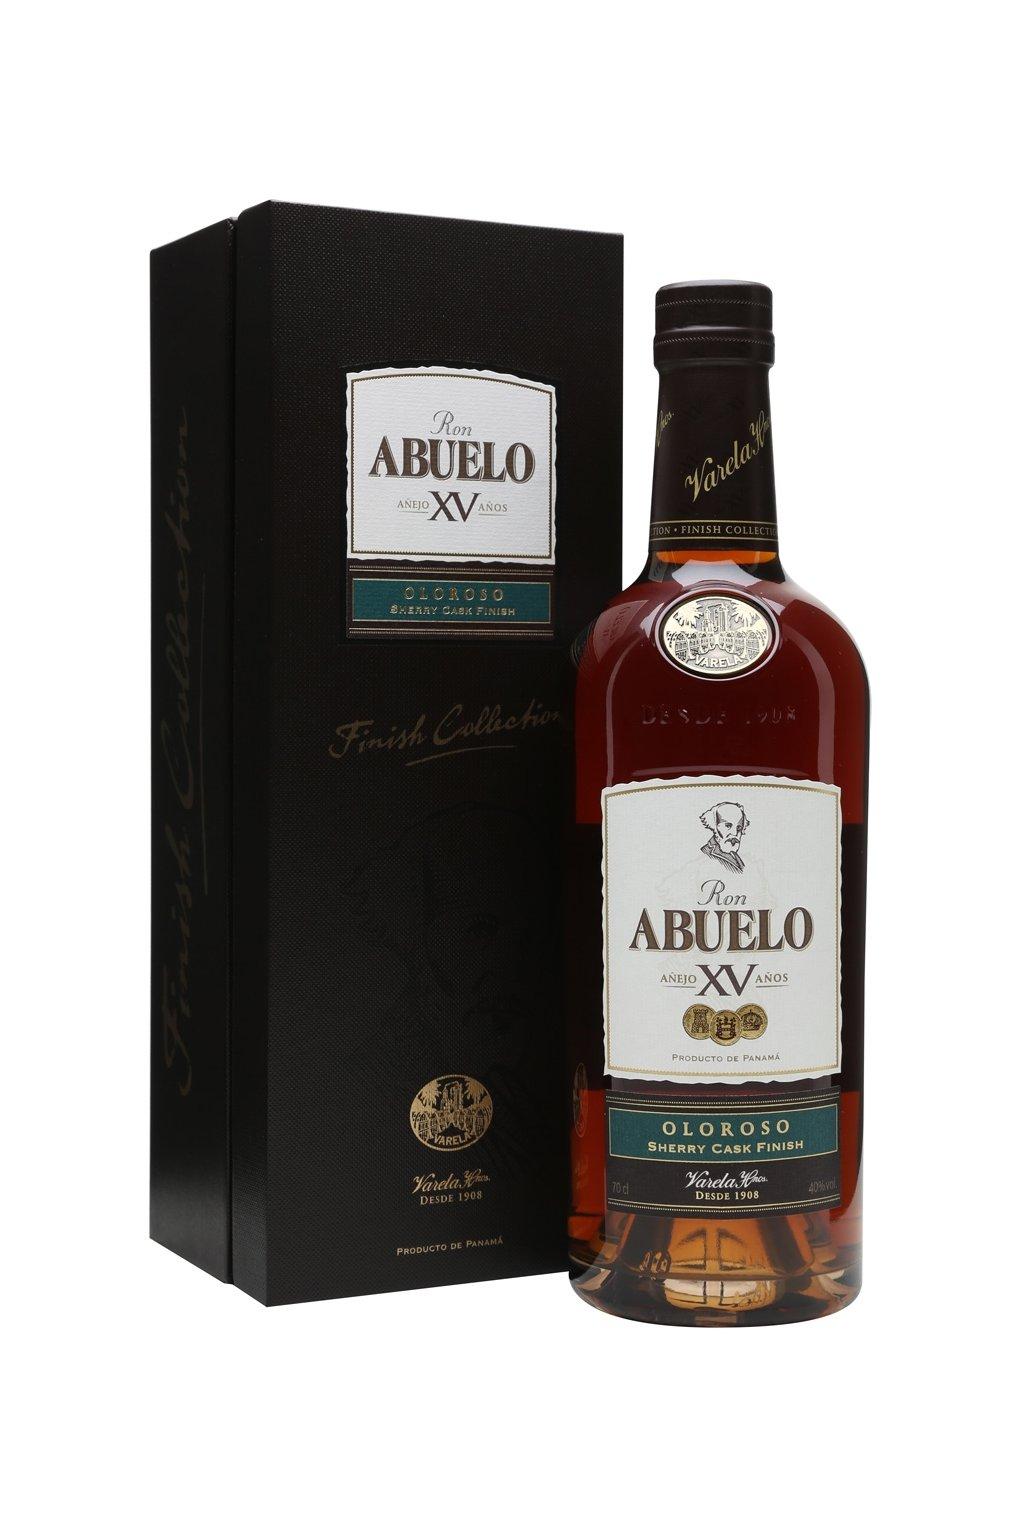 abuelo sherry oloroso